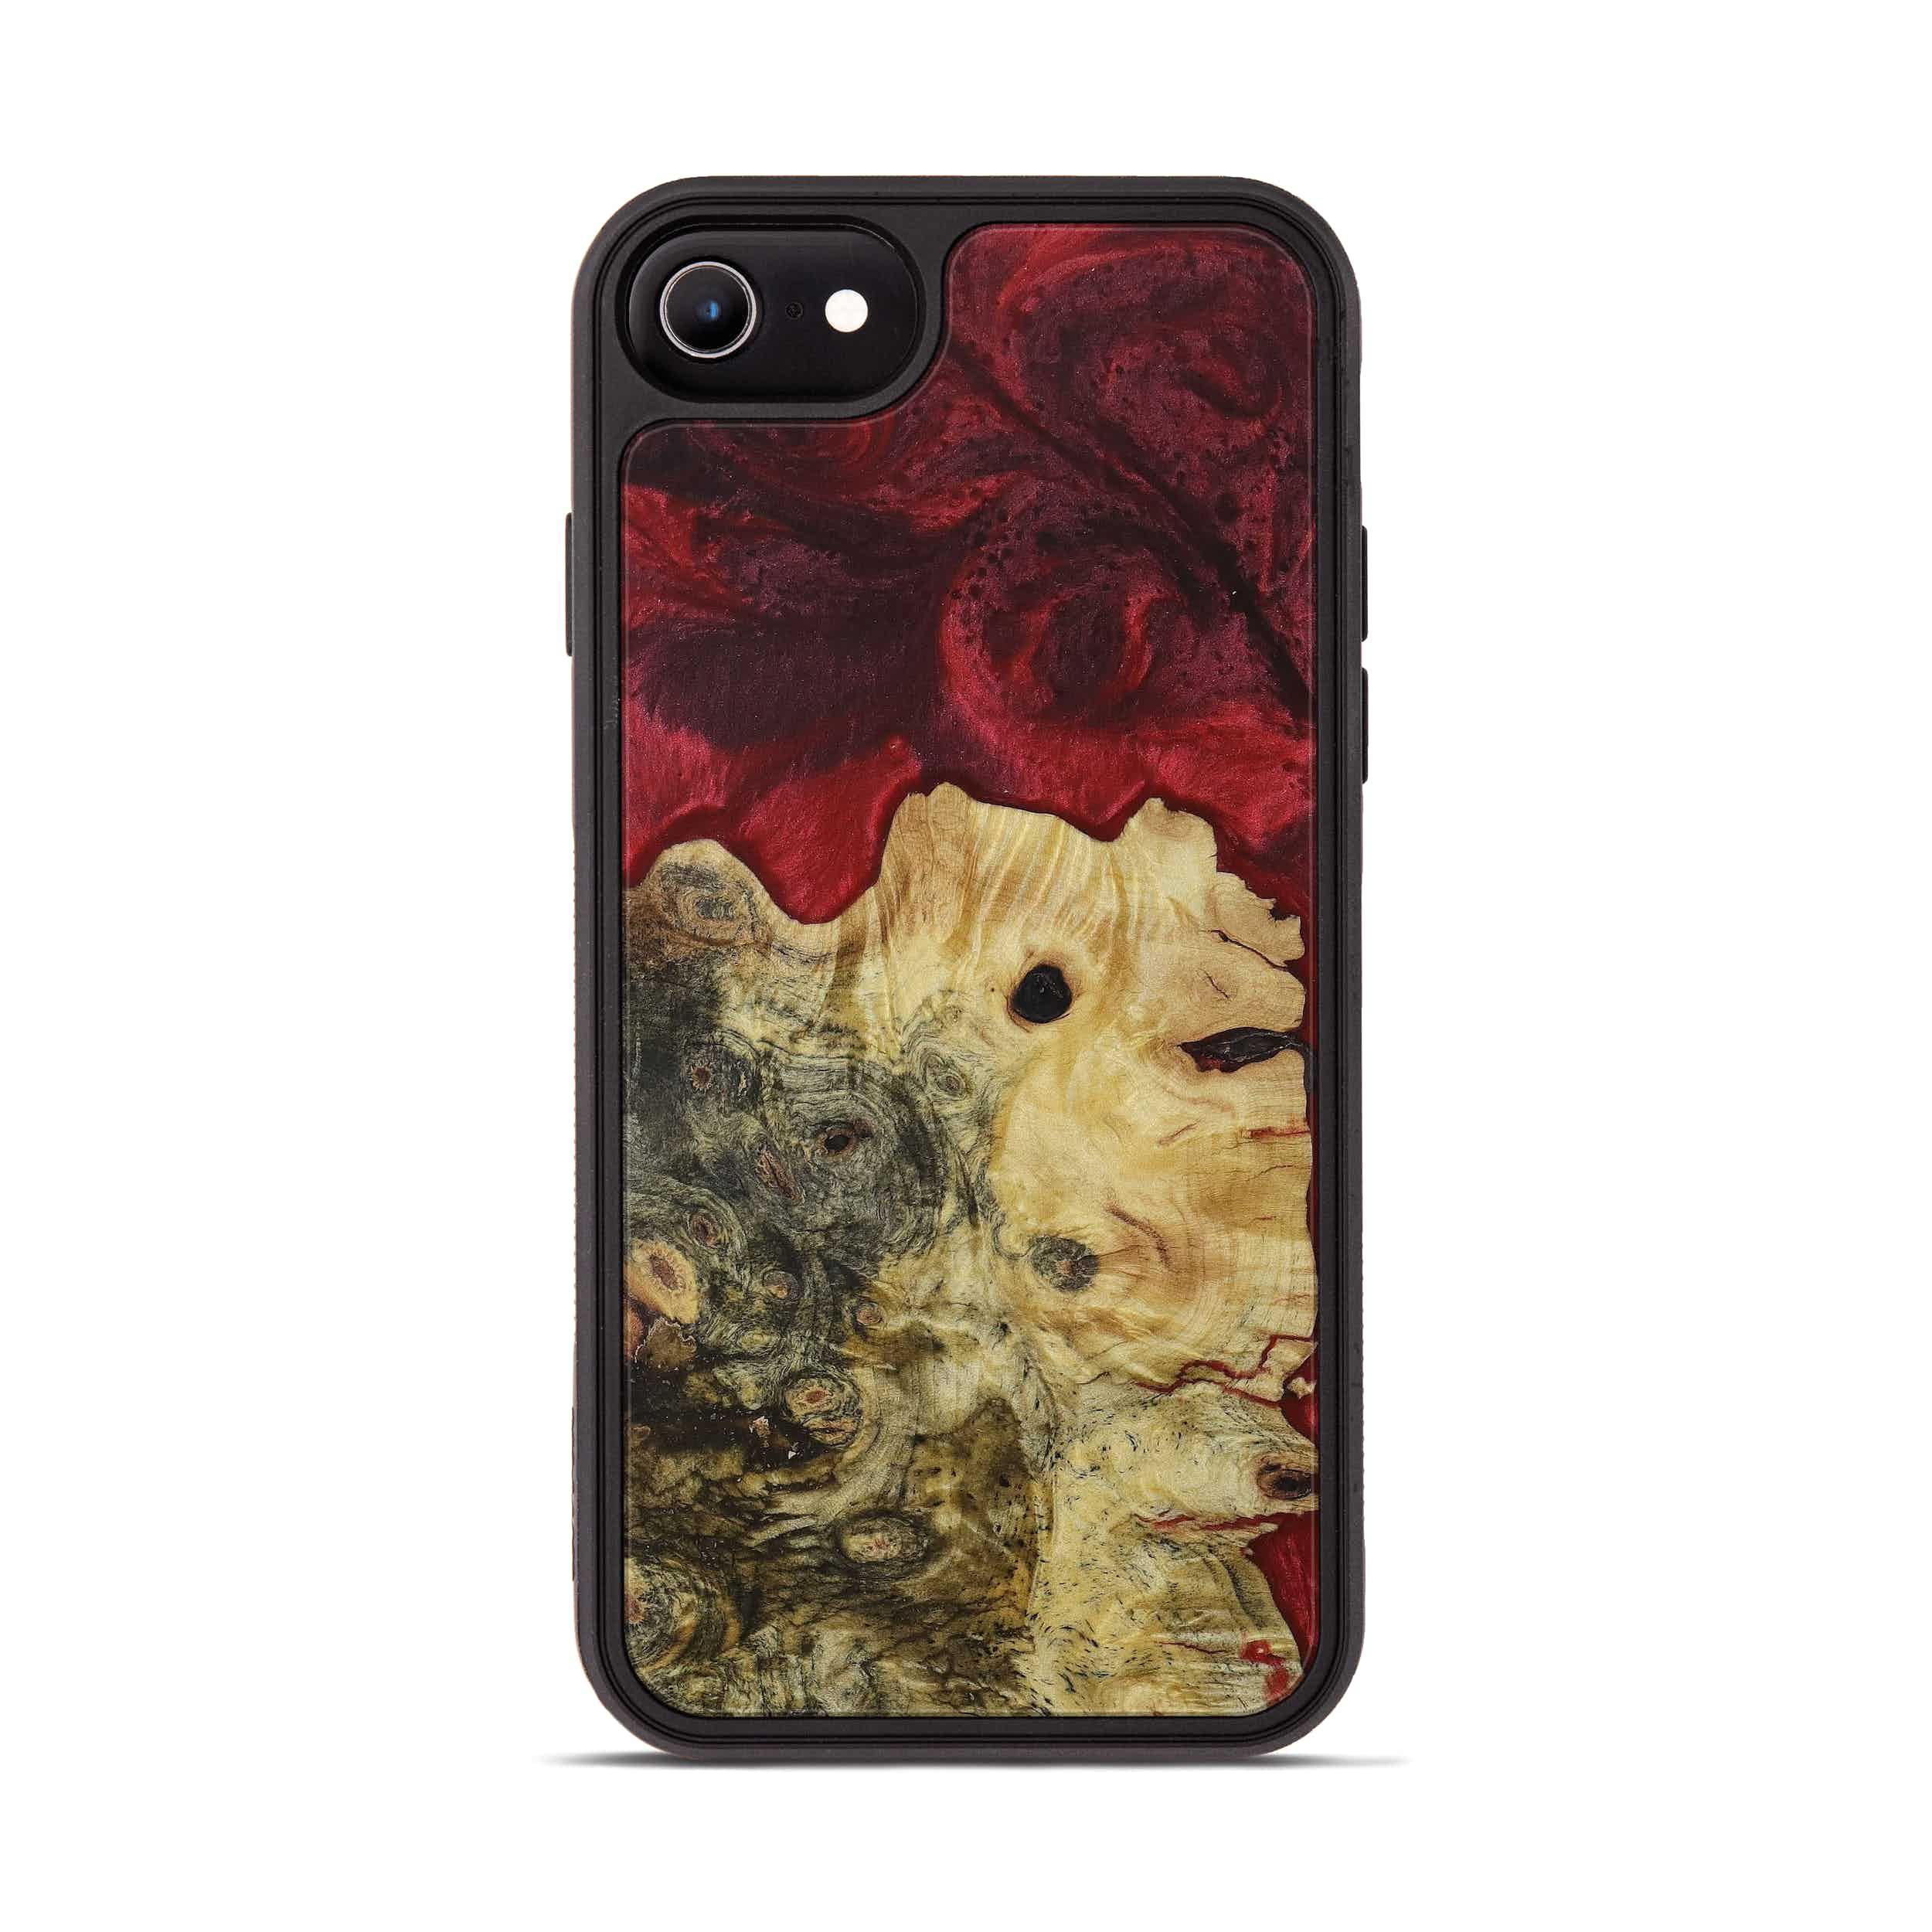 iPhone 6s Wood+Resin Phone Case - Orella (Dark Red, 395934)